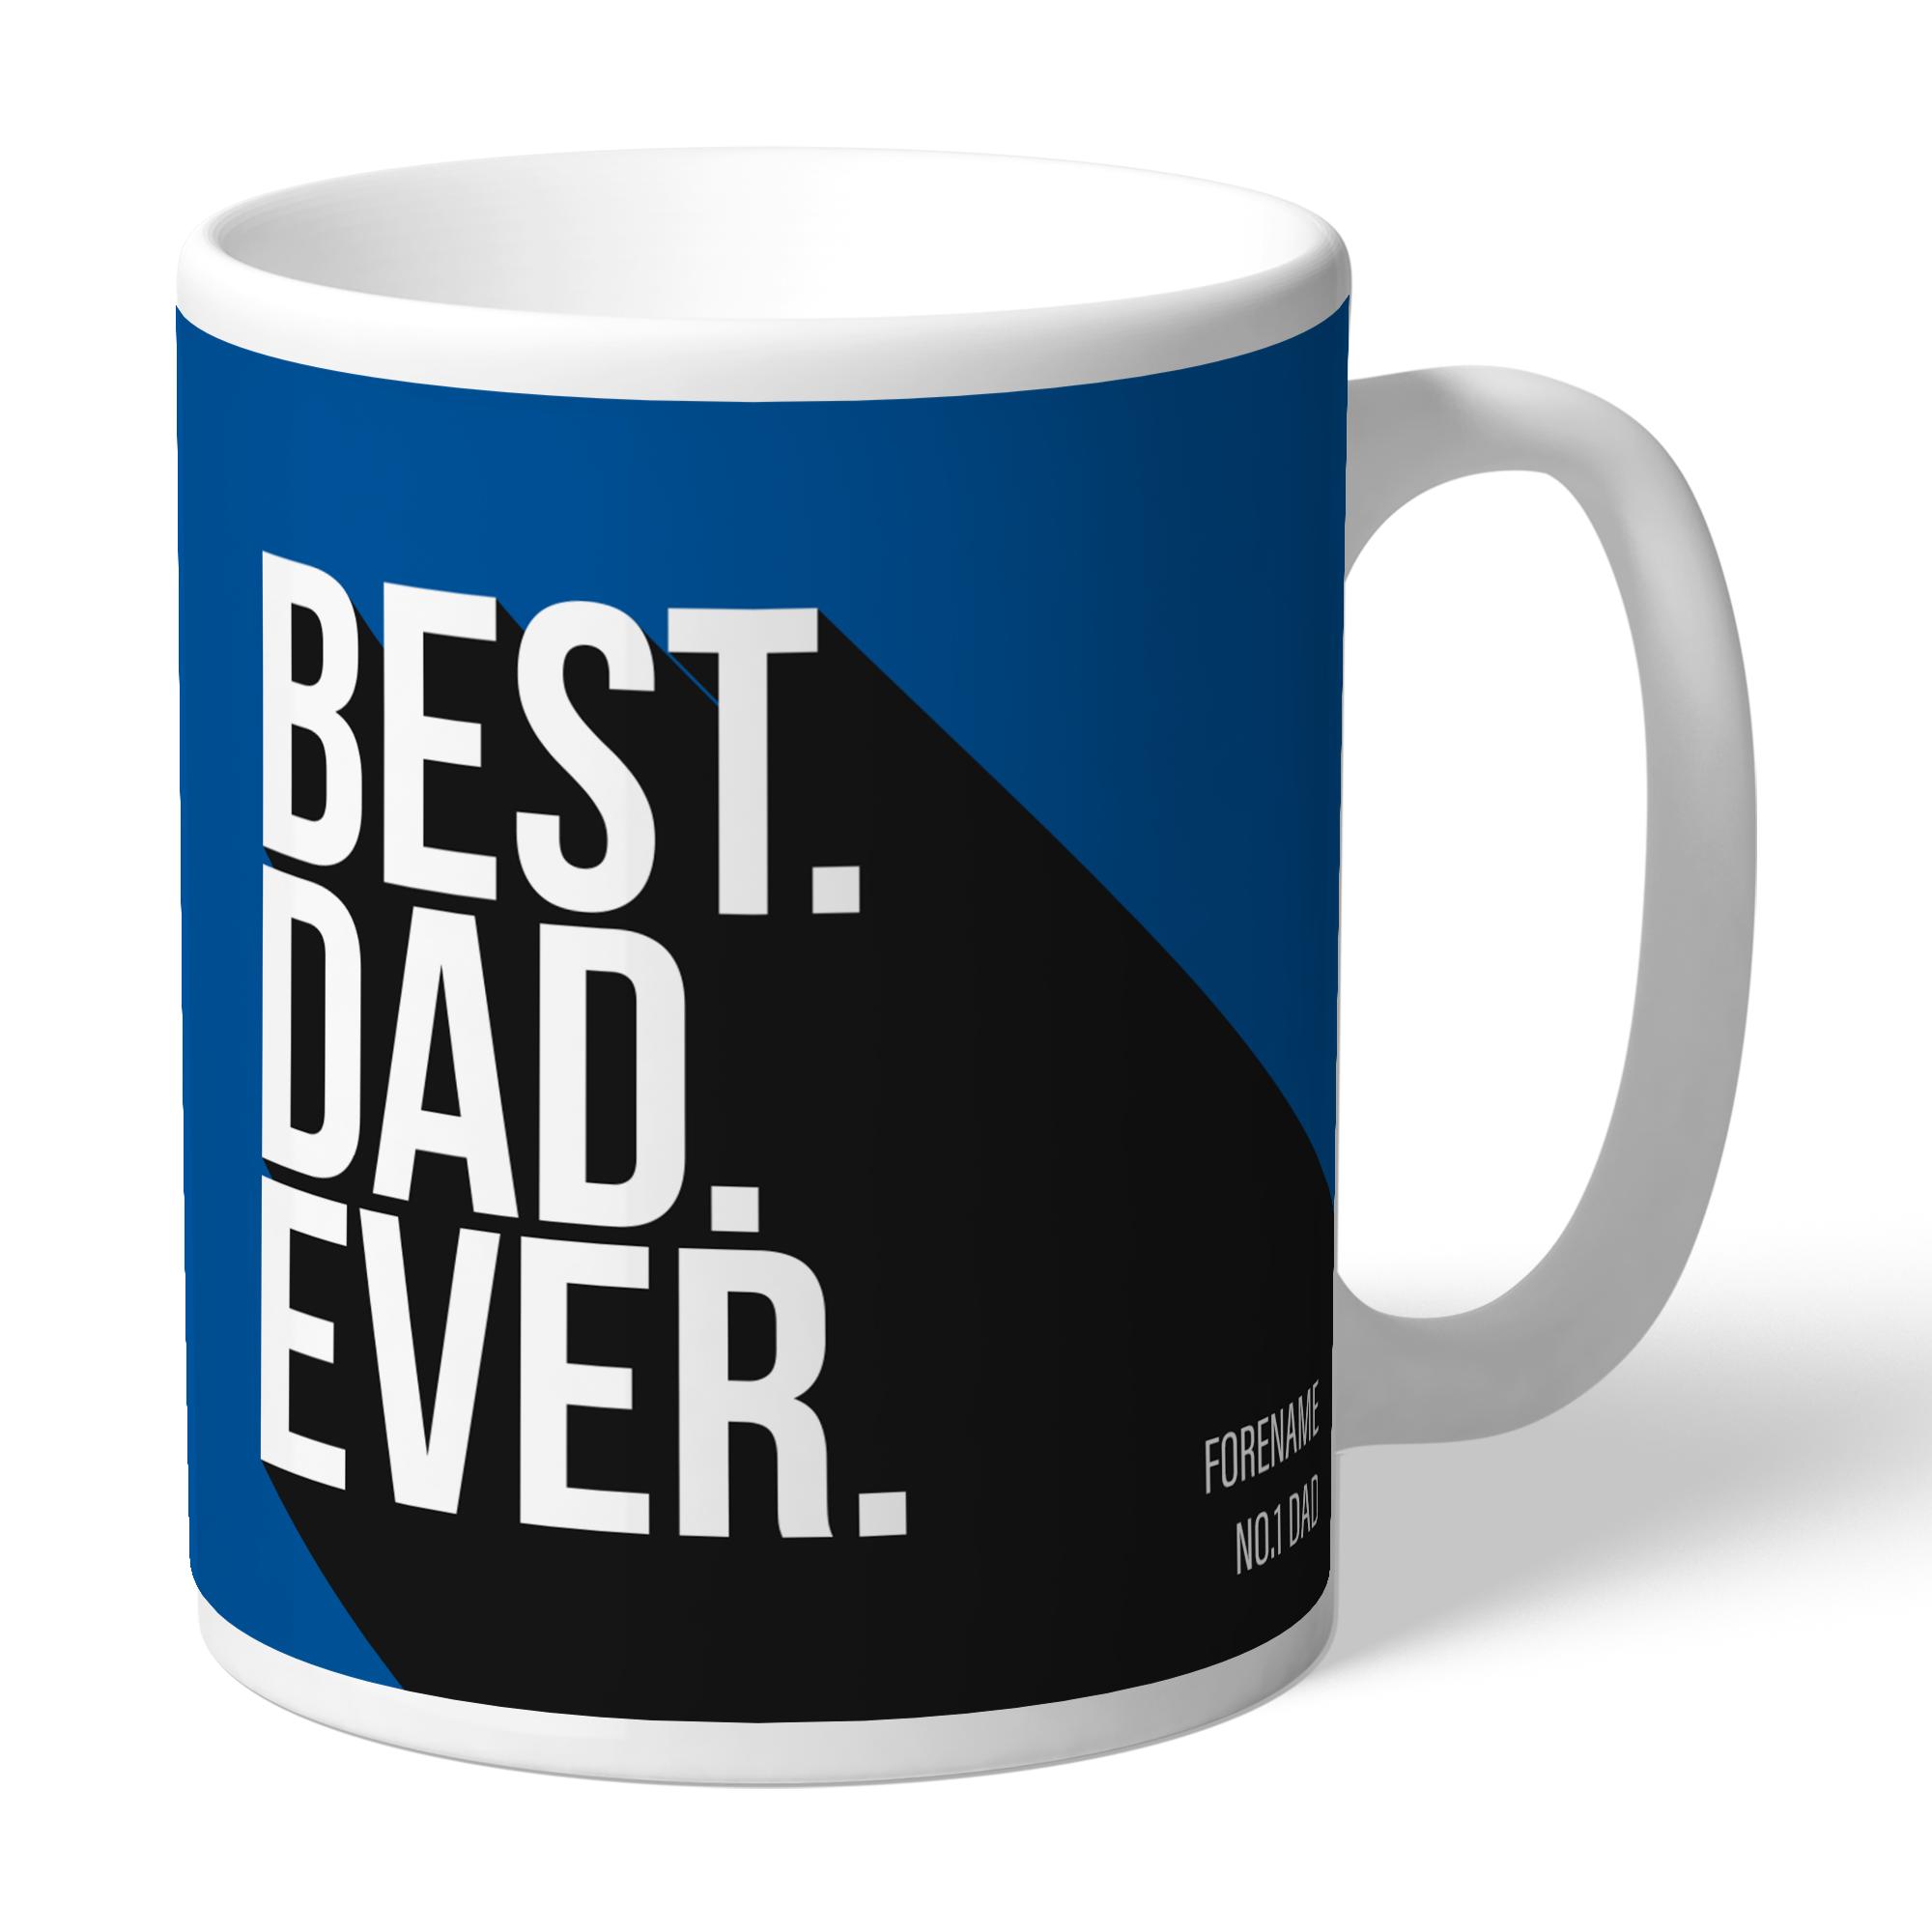 Birmingham City Best Dad Ever Mug